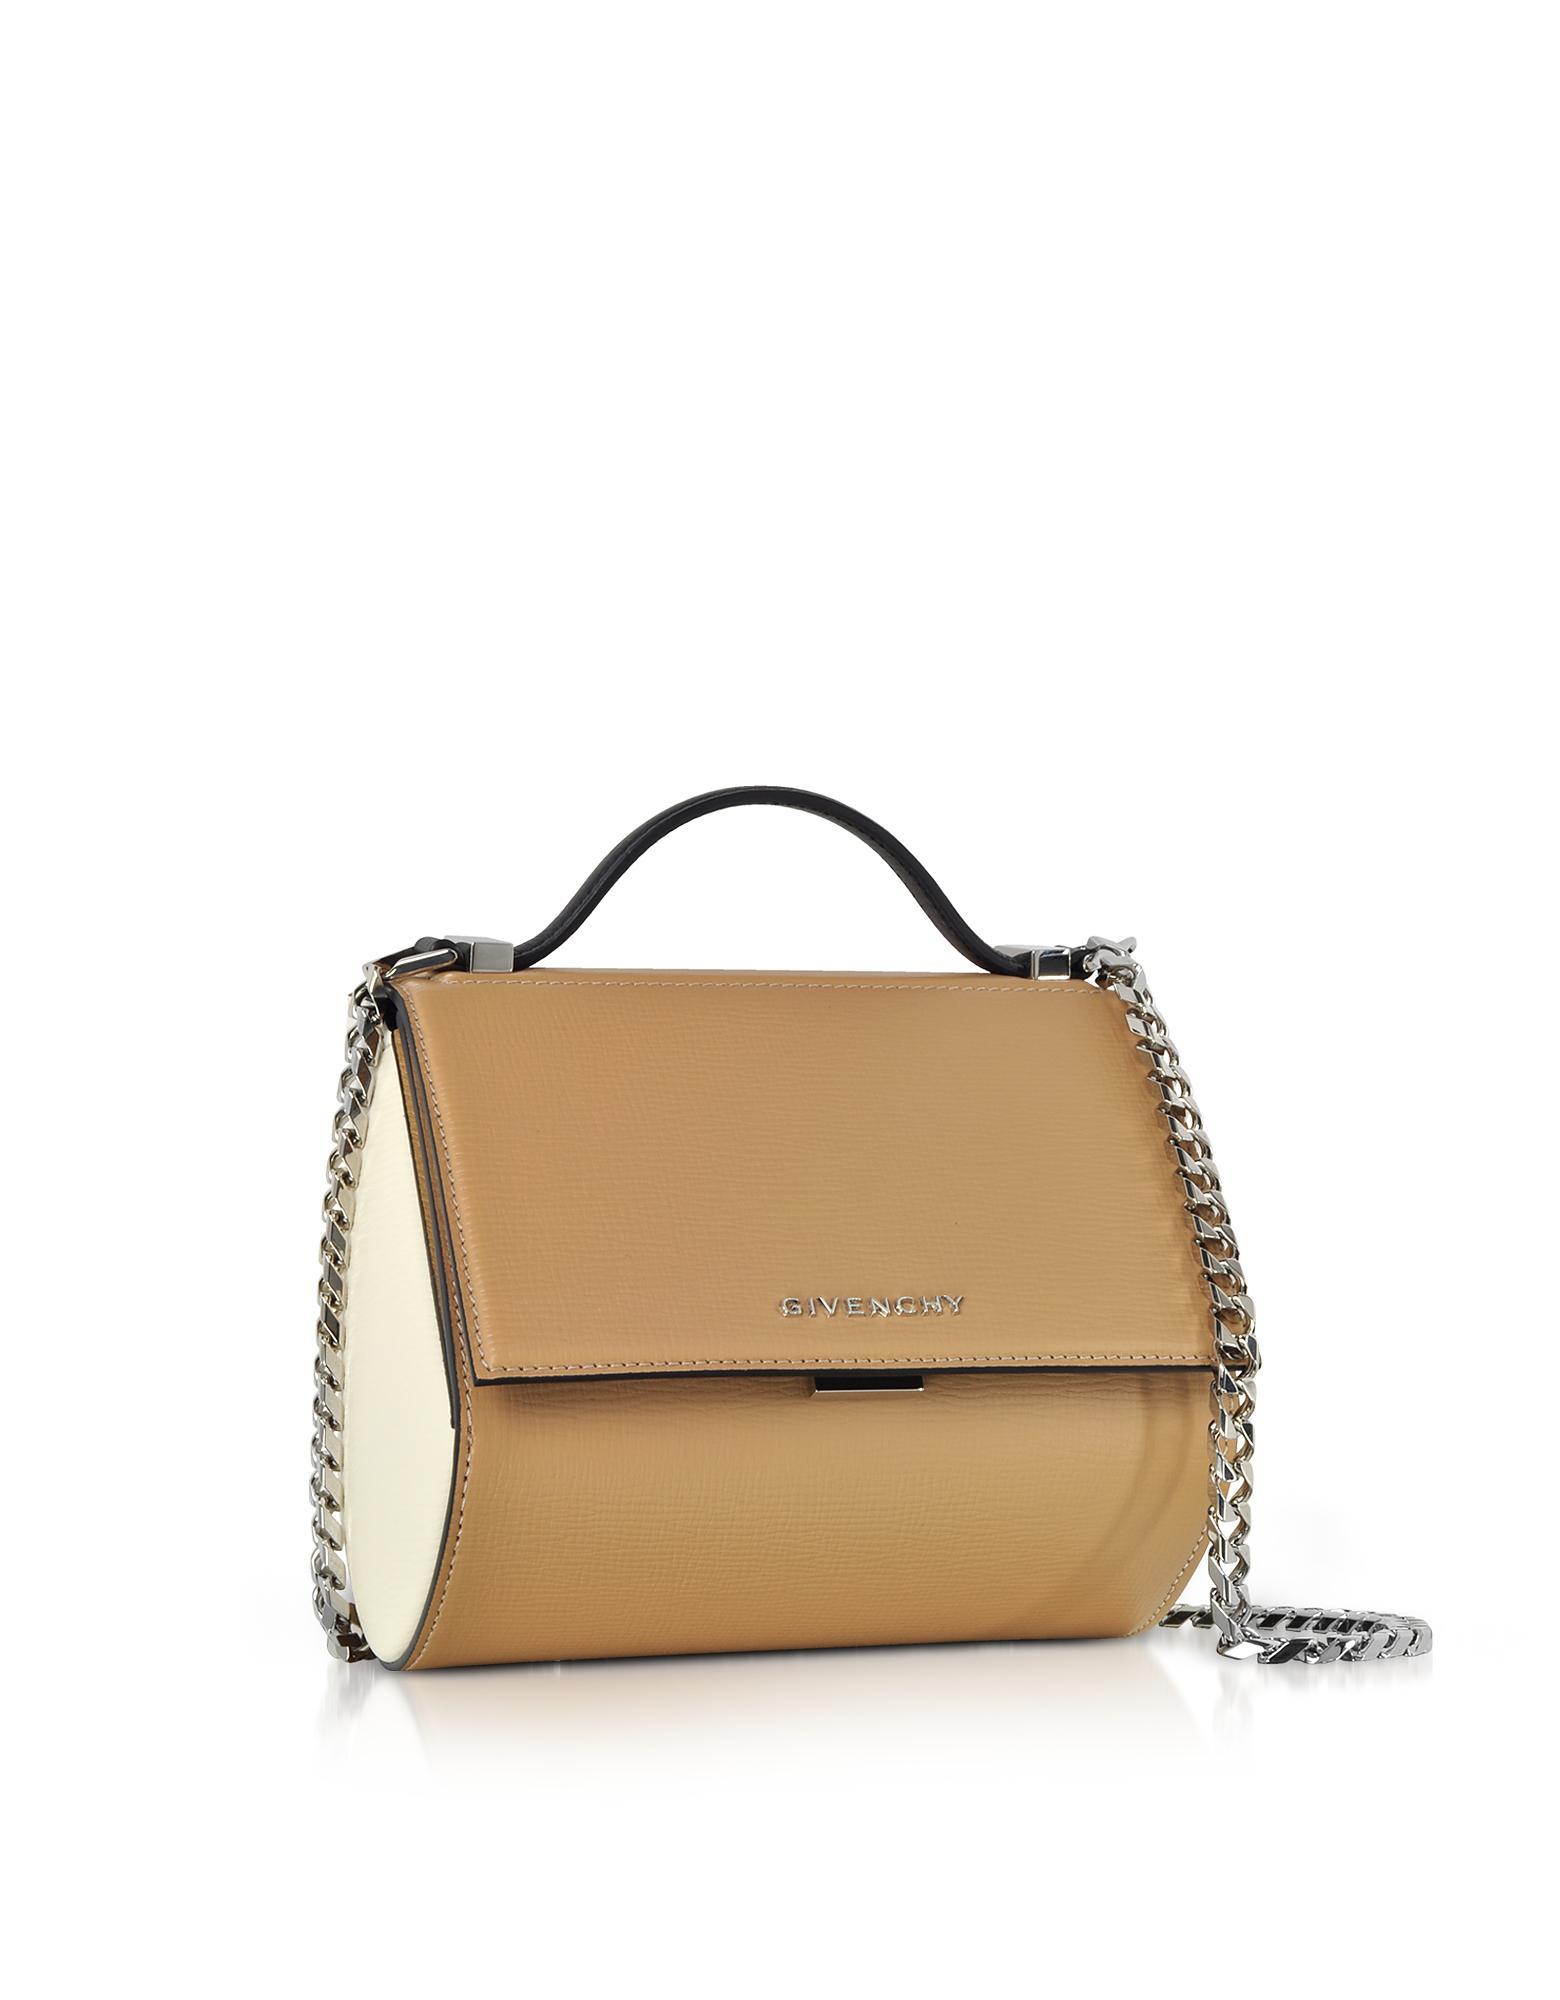 Givenchy Light Beige Pandora Box Crossbody Bag in Natural - Lyst 7620b062d30d0